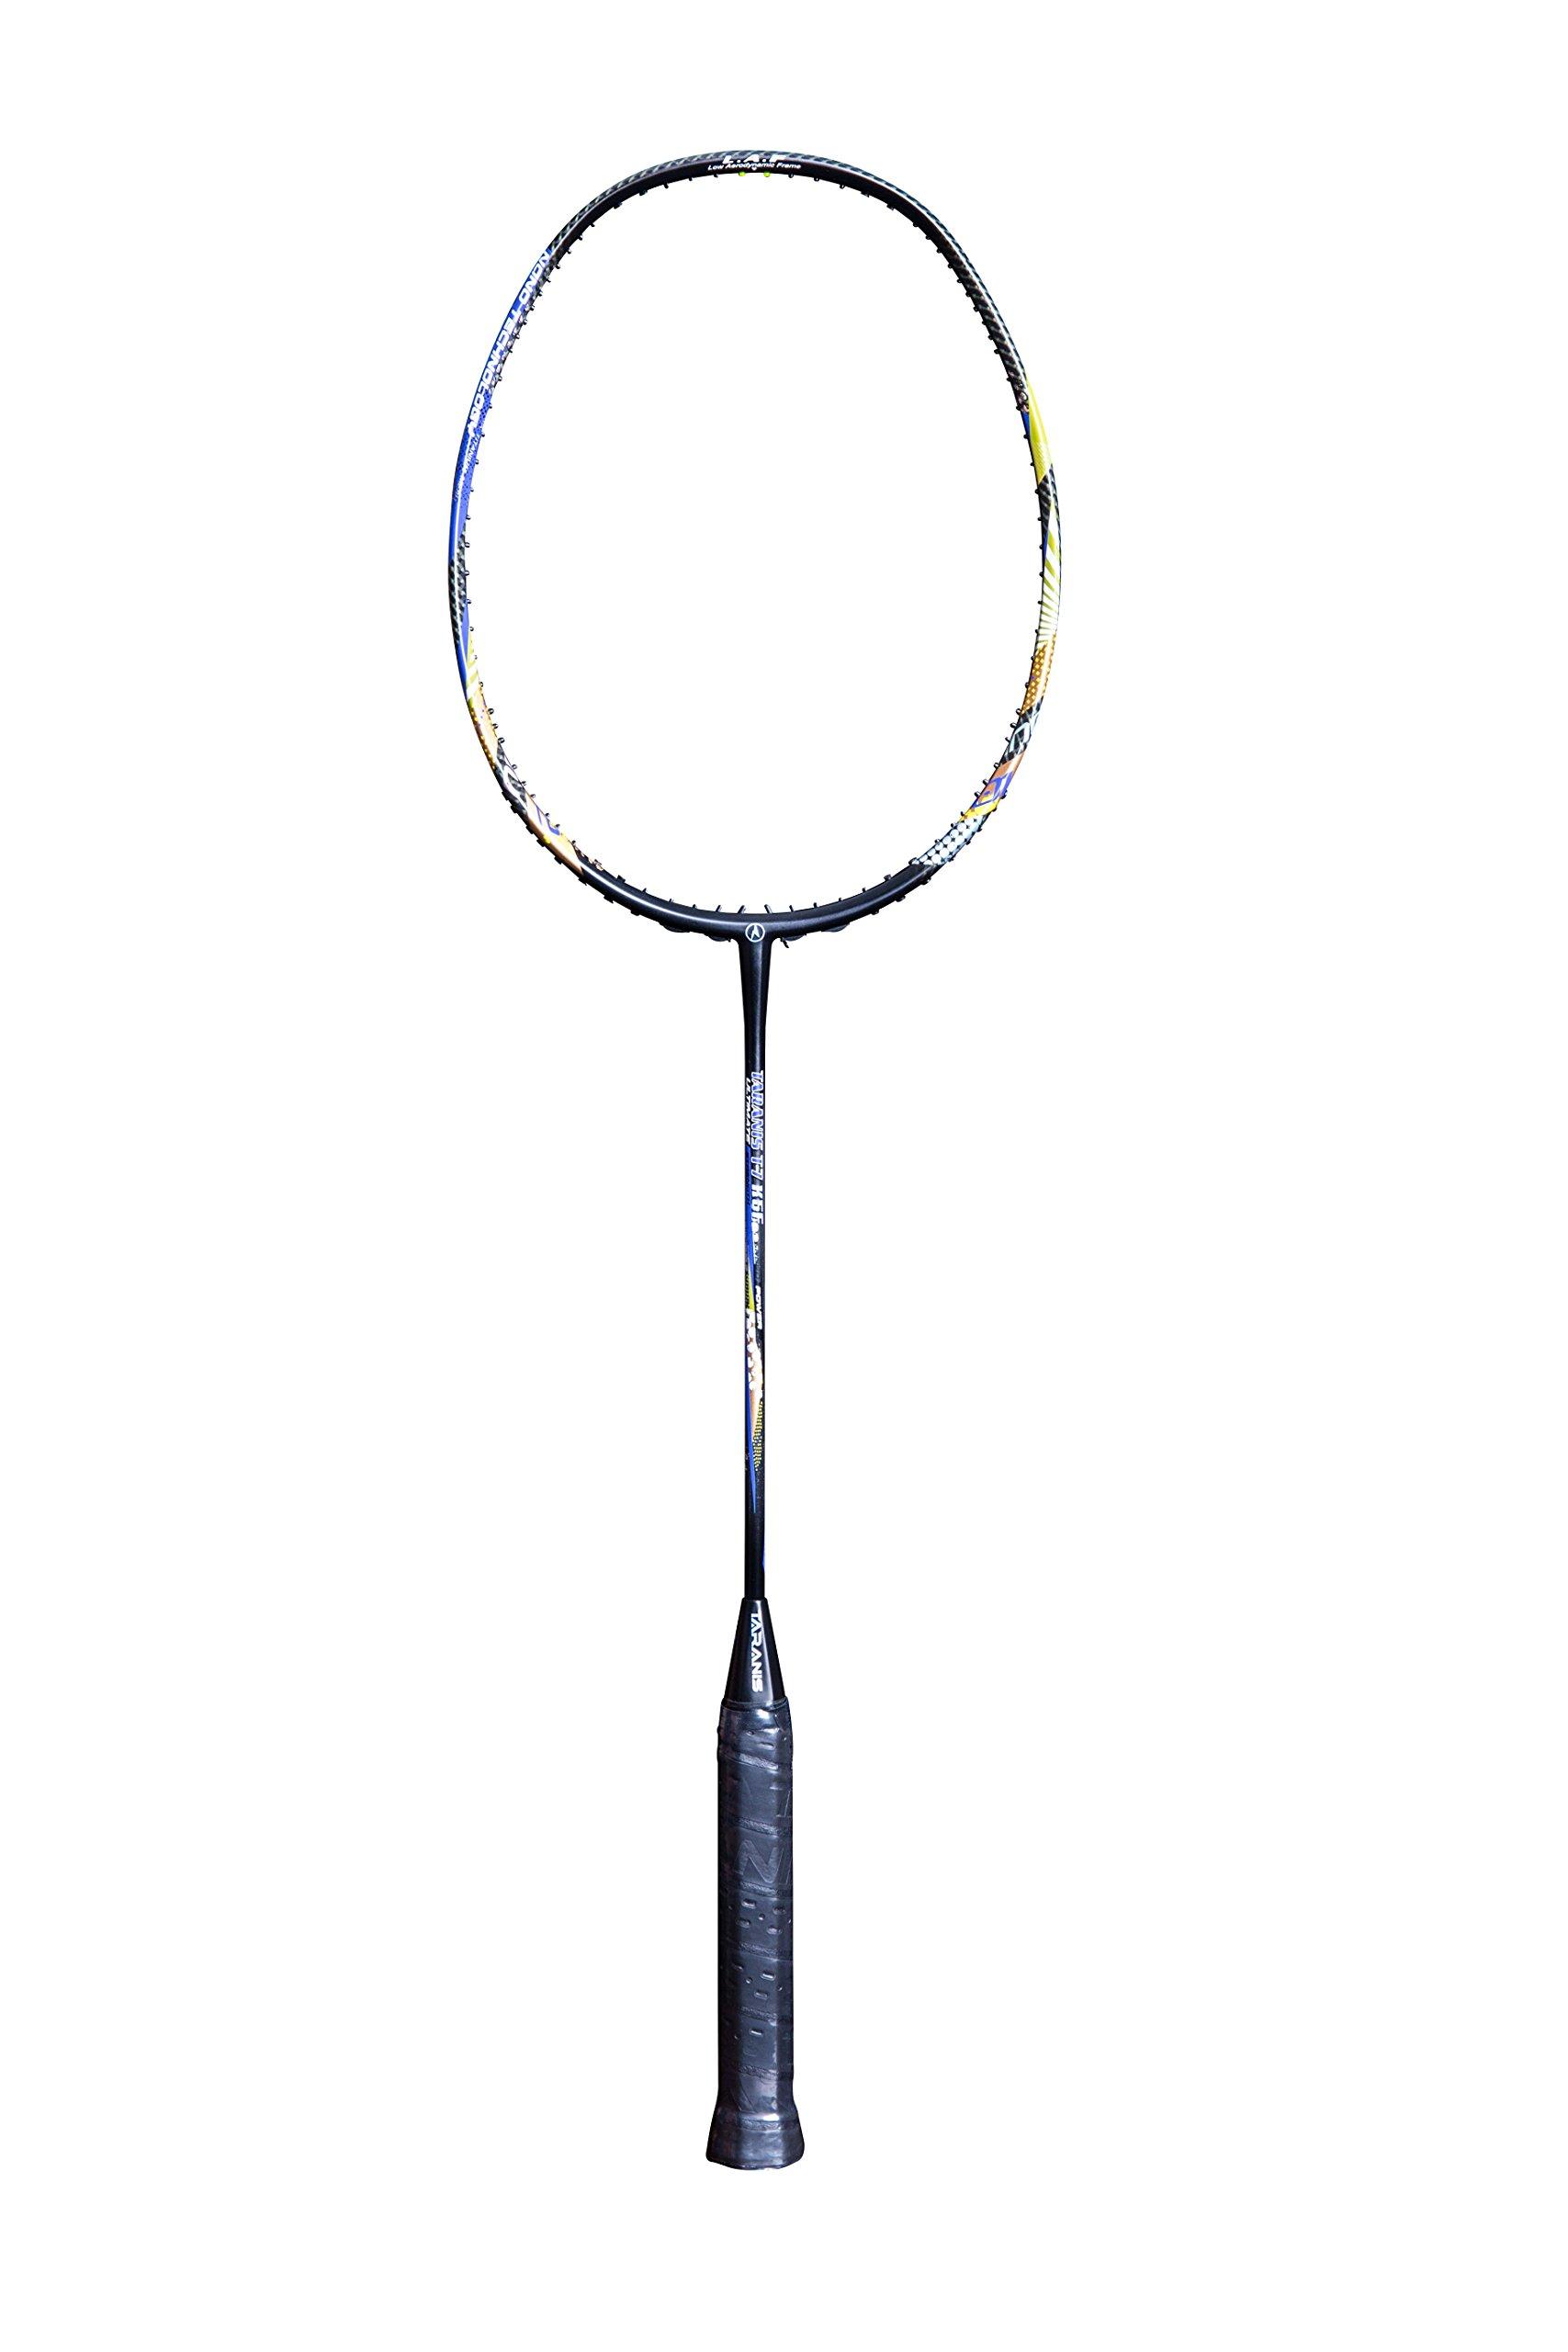 TARANIS Badminton racket T-7 K5 F Black+Gold